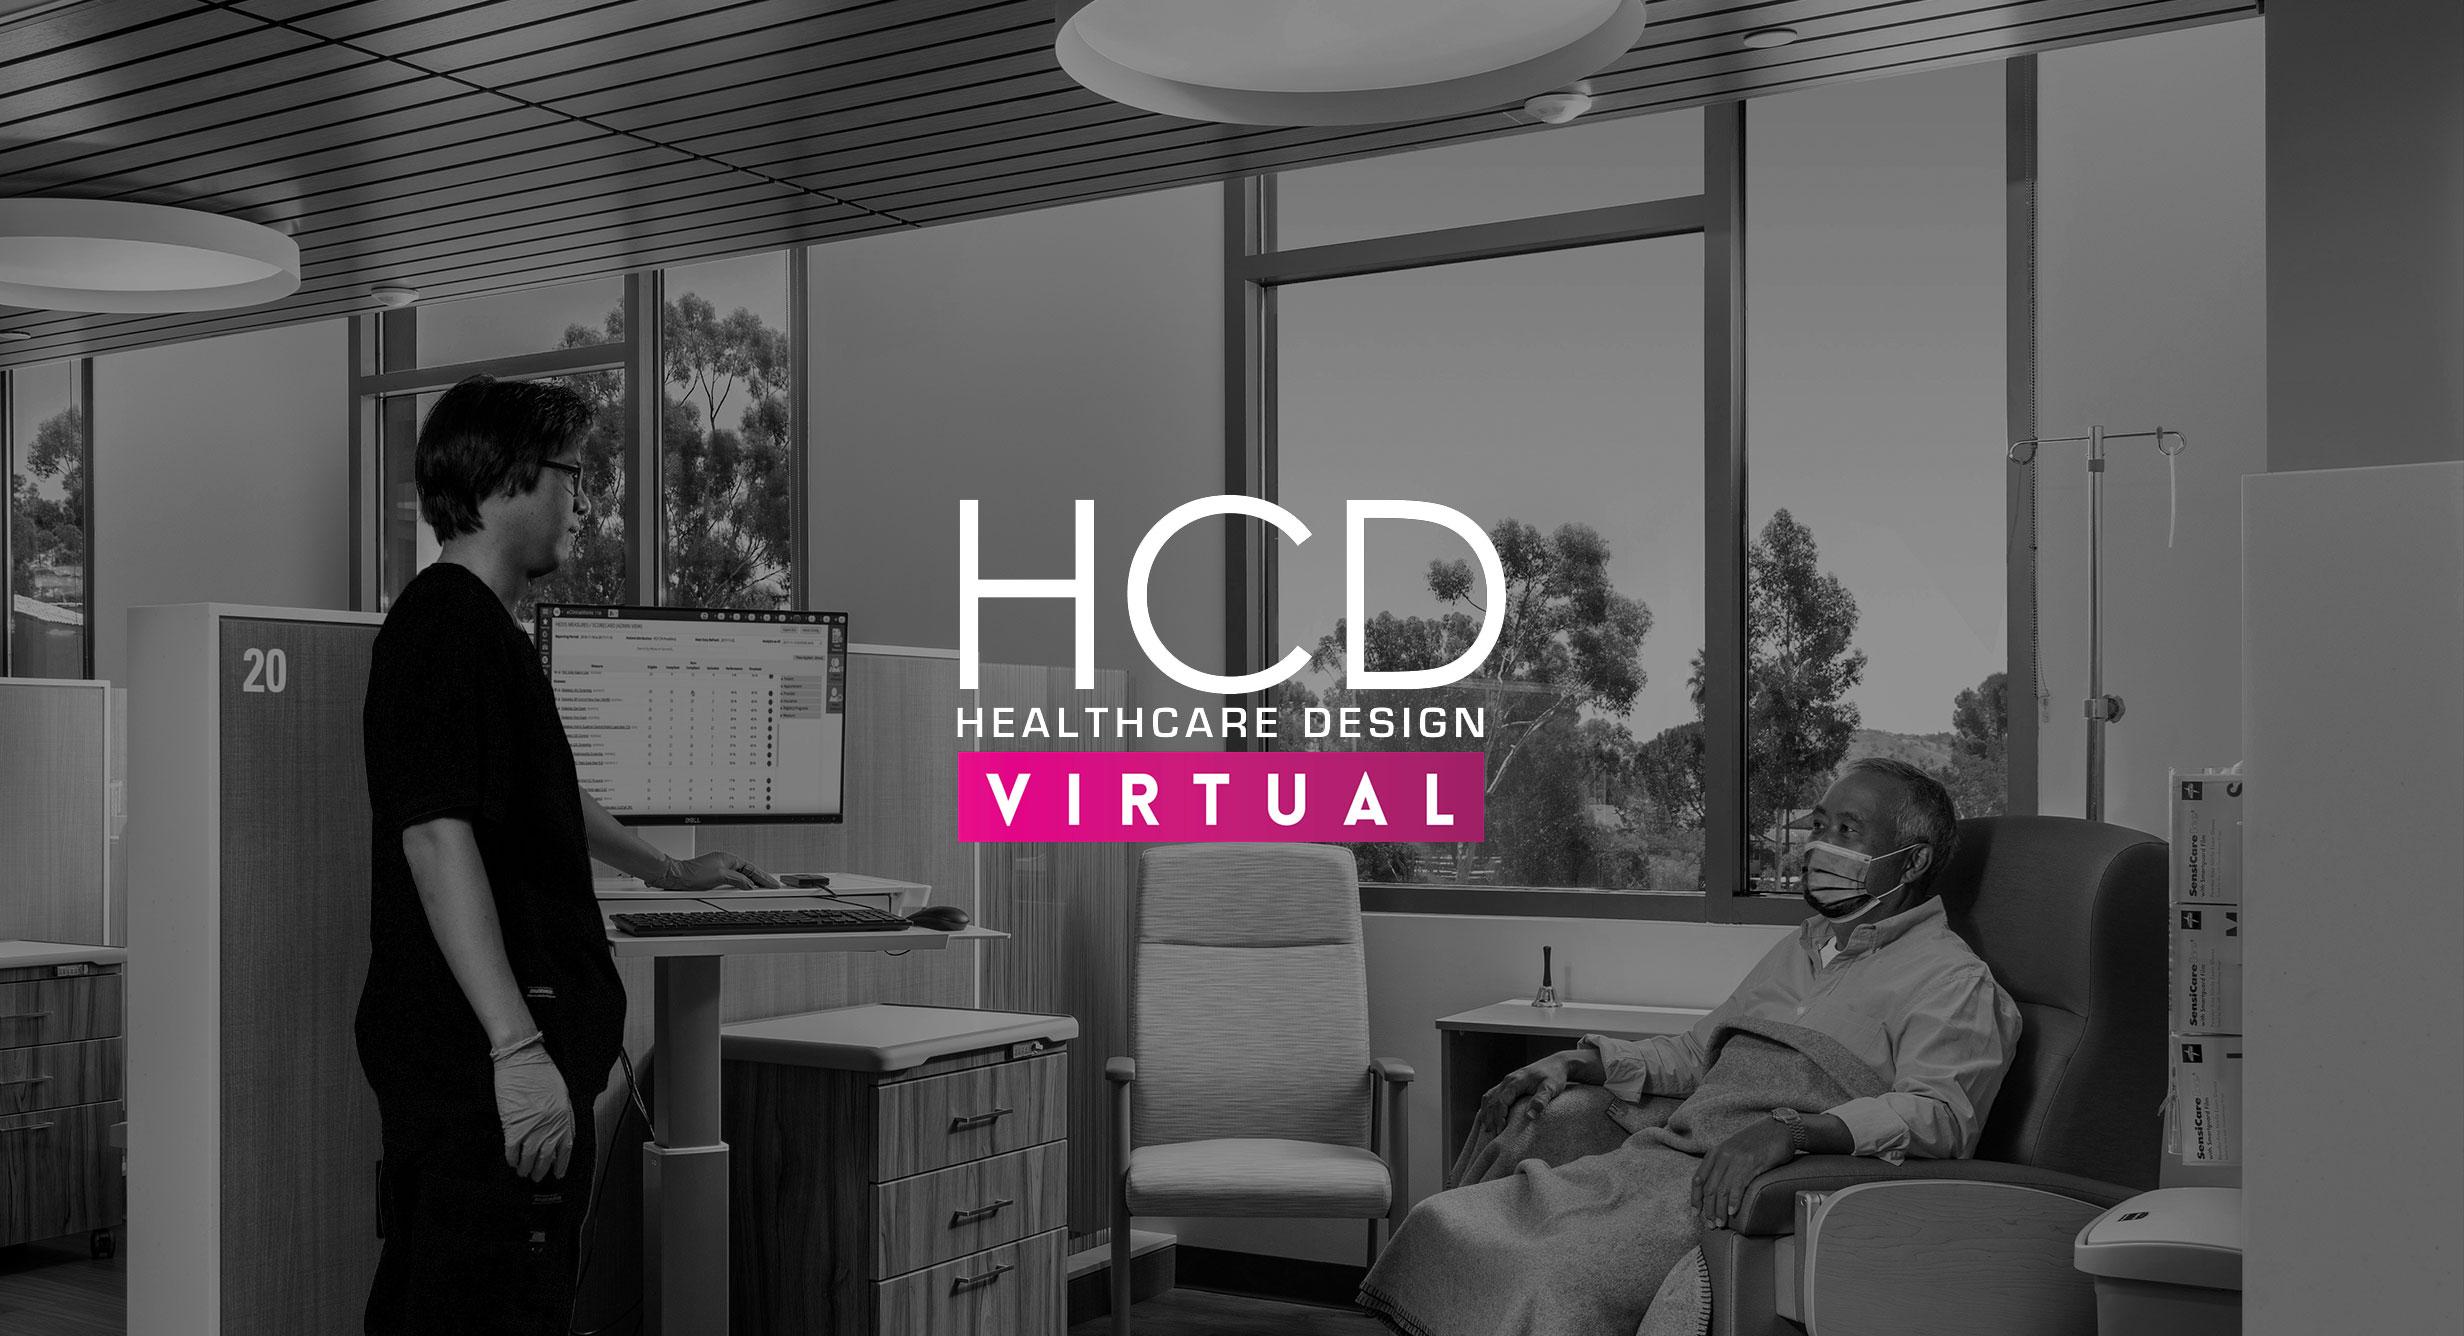 Seven HKS Health Design Leaders to Speak at the HCD Healthcare Design Virtual Conference